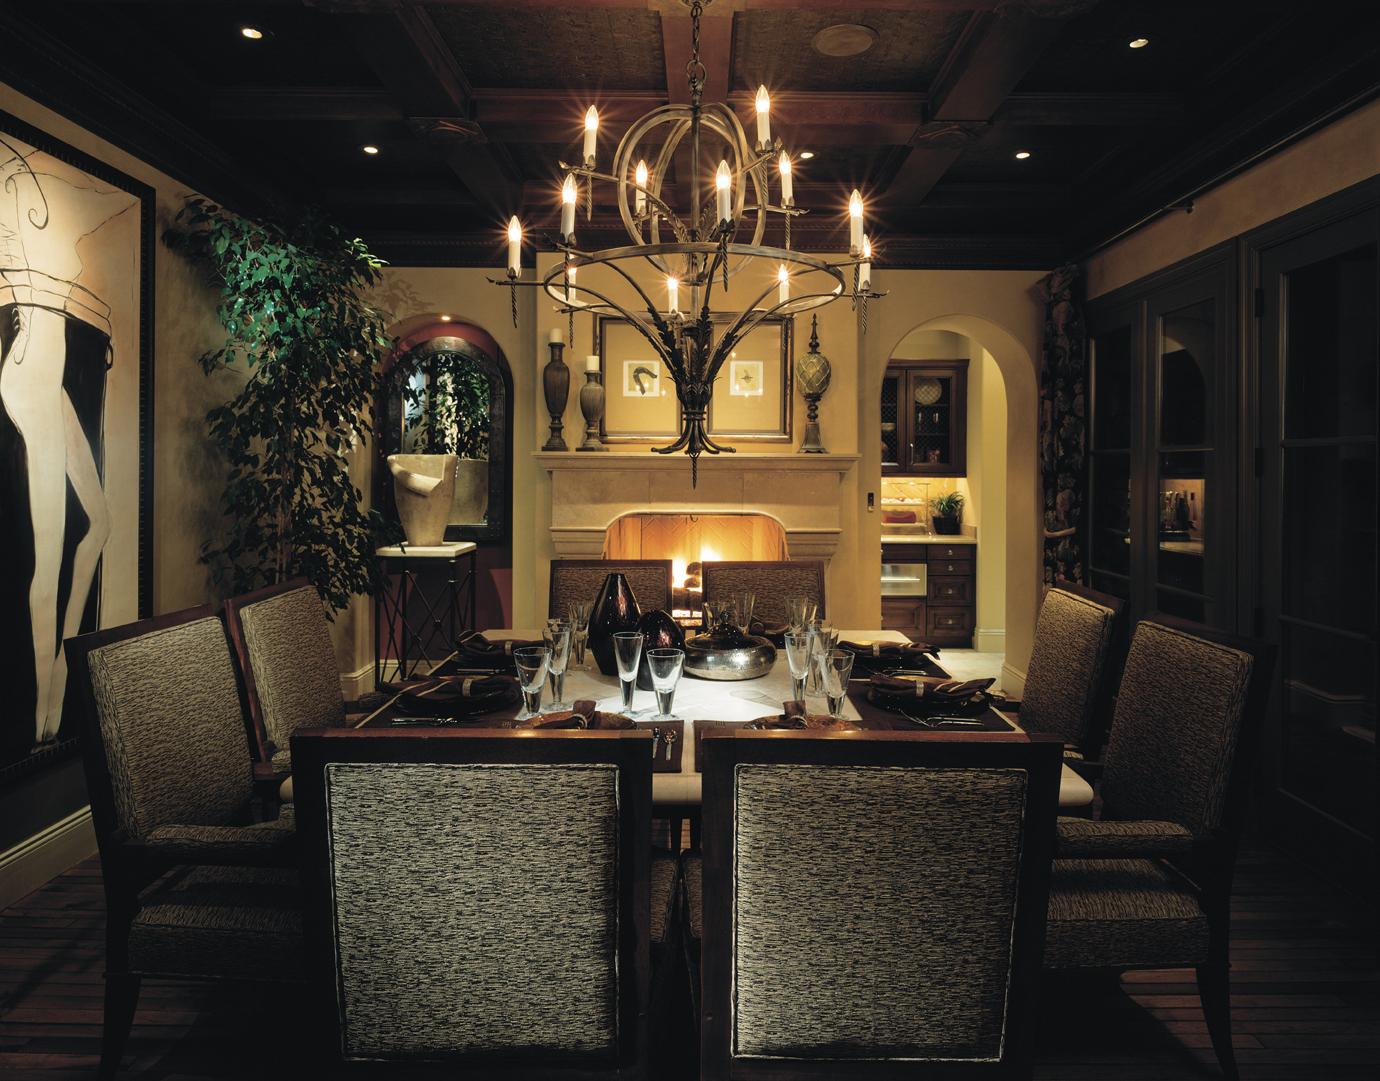 extraordinary dining room lighting نصائح هامة عند شراء غرف السفرة